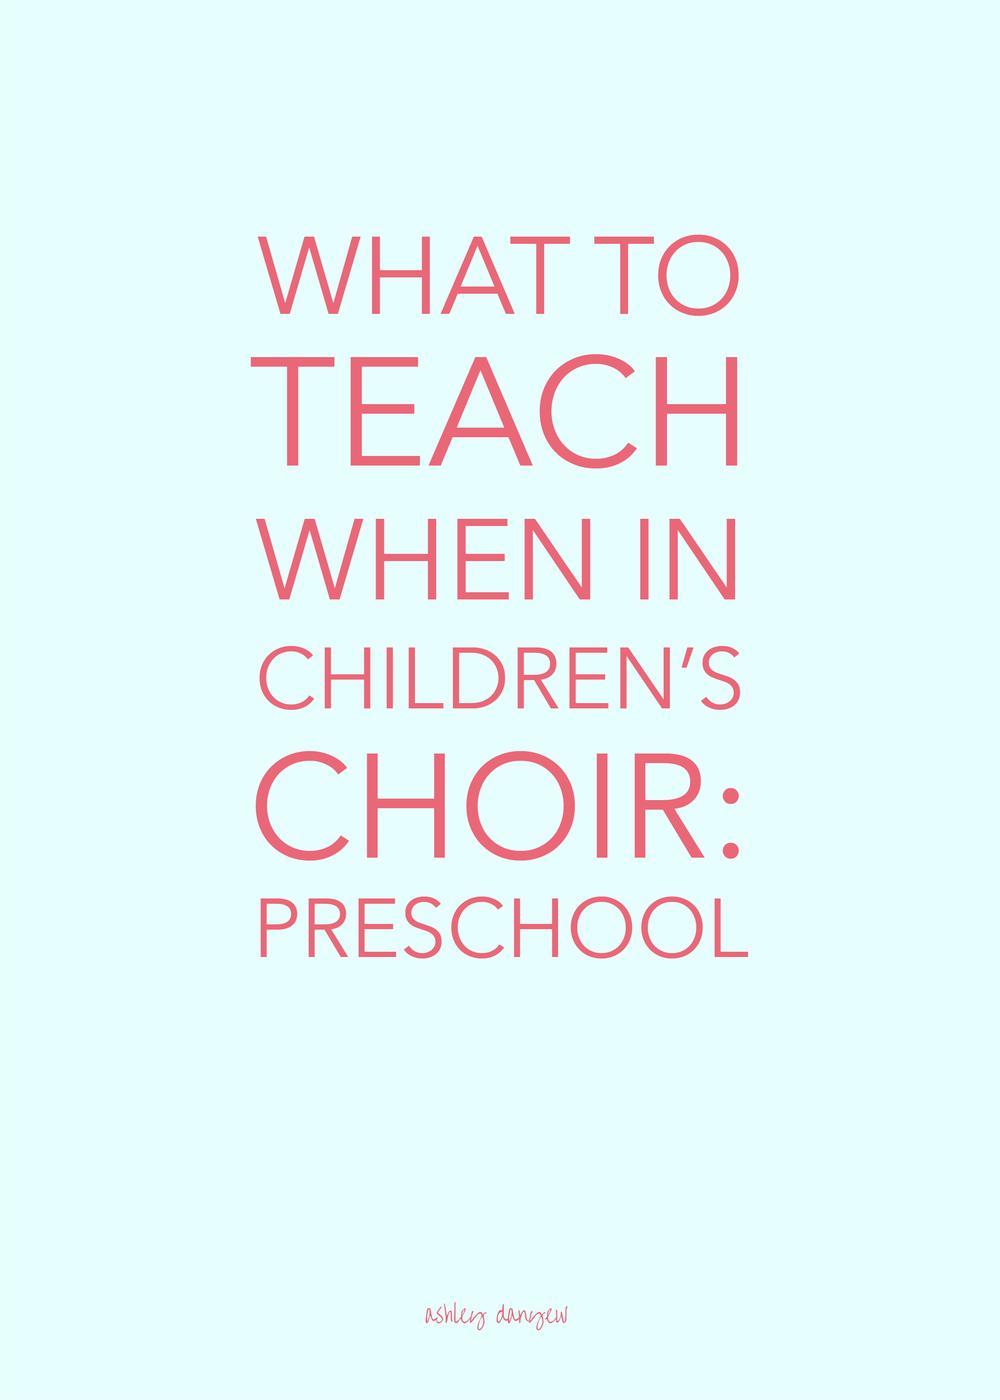 What to Teach When in Children's Choir - Preschool-52.png